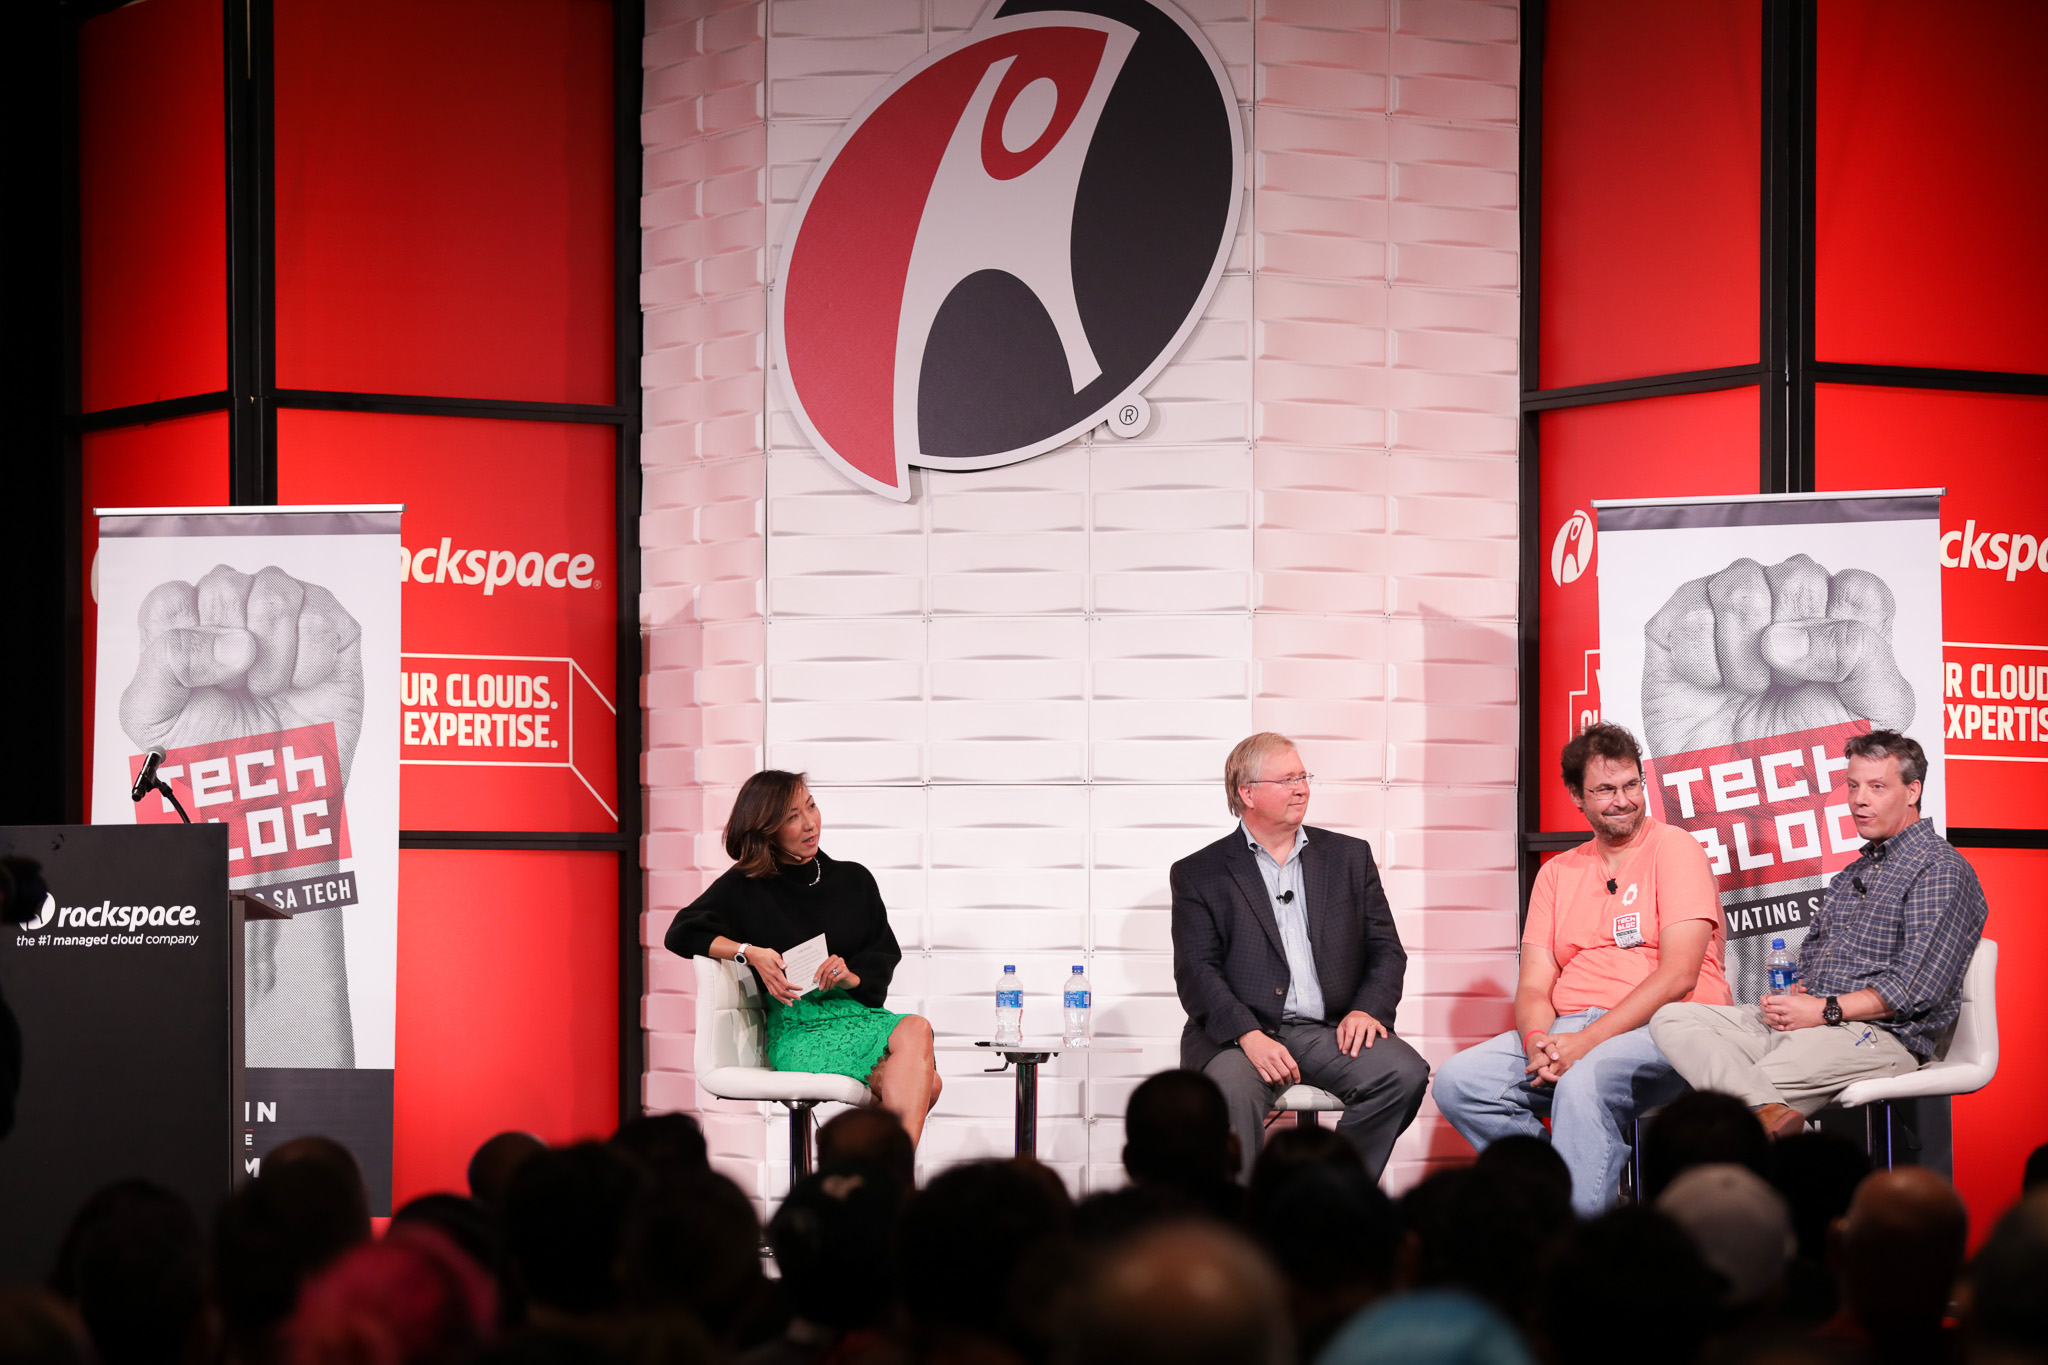 (From left) Rachel Woodson moderates a panel of former Rackspace executives Graham Weston, Dirk Elmendorf, and Lew Moorman.